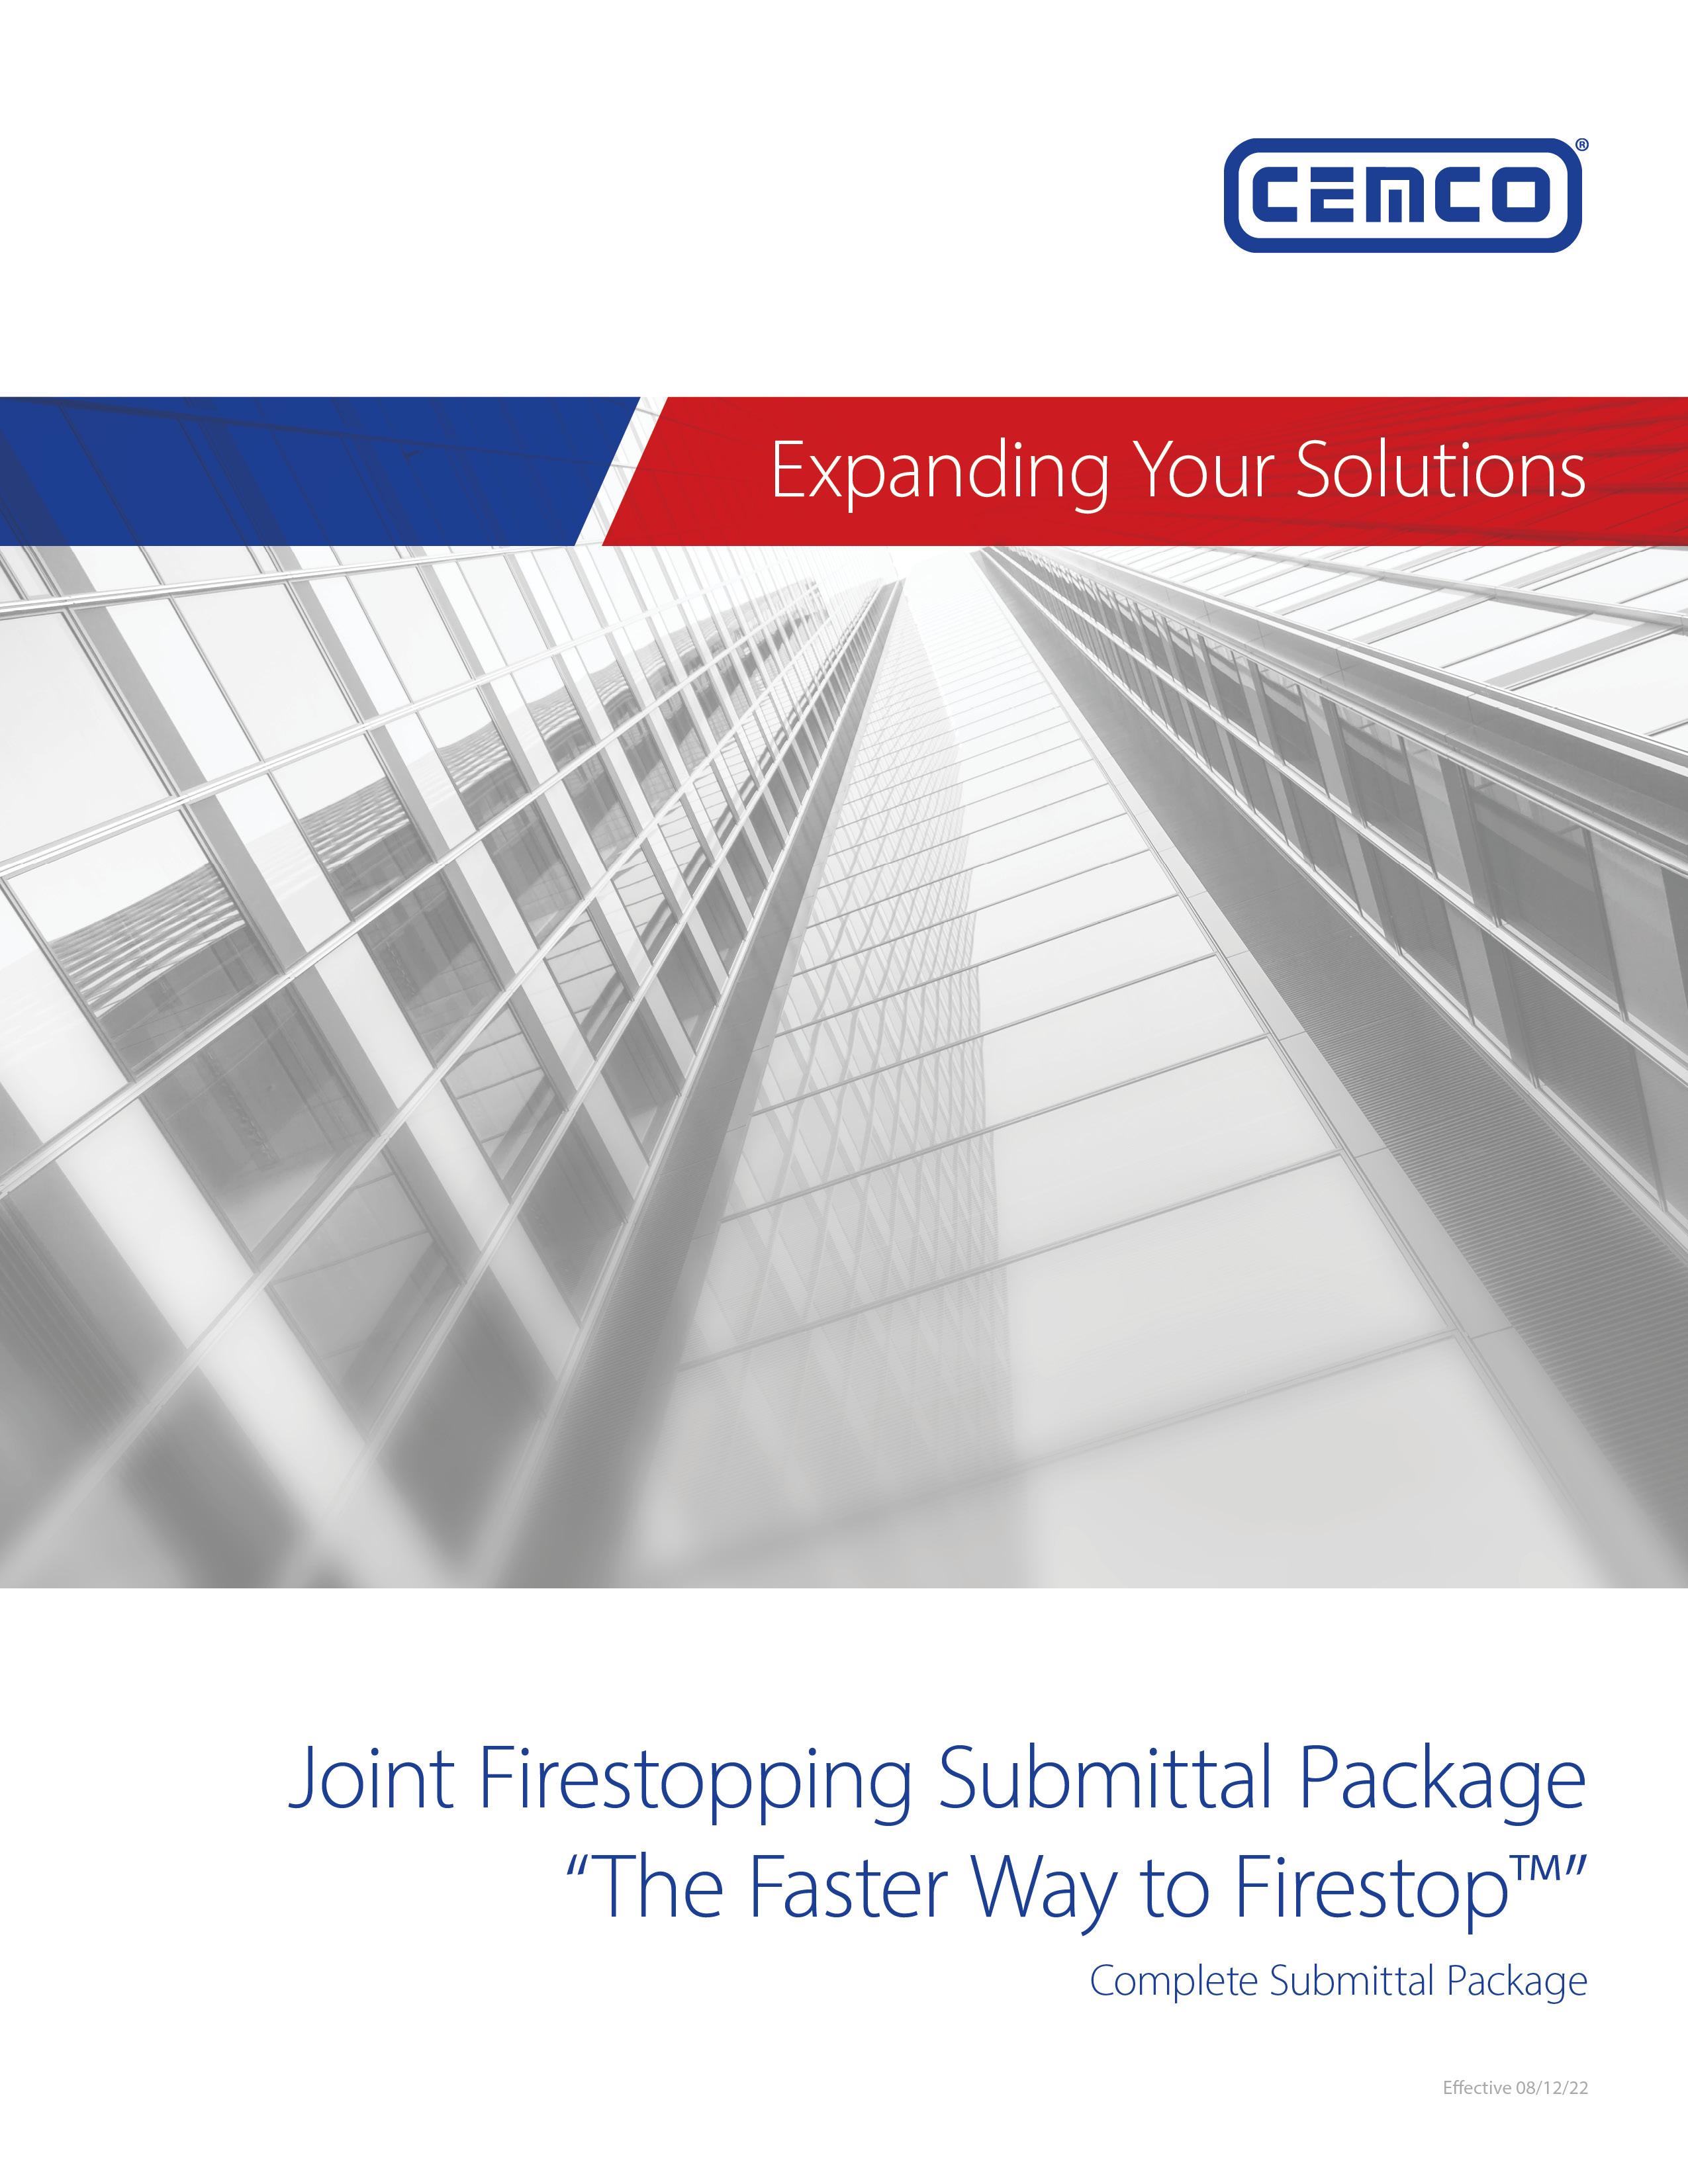 Joint FS Sub Pkg Catalog Cover